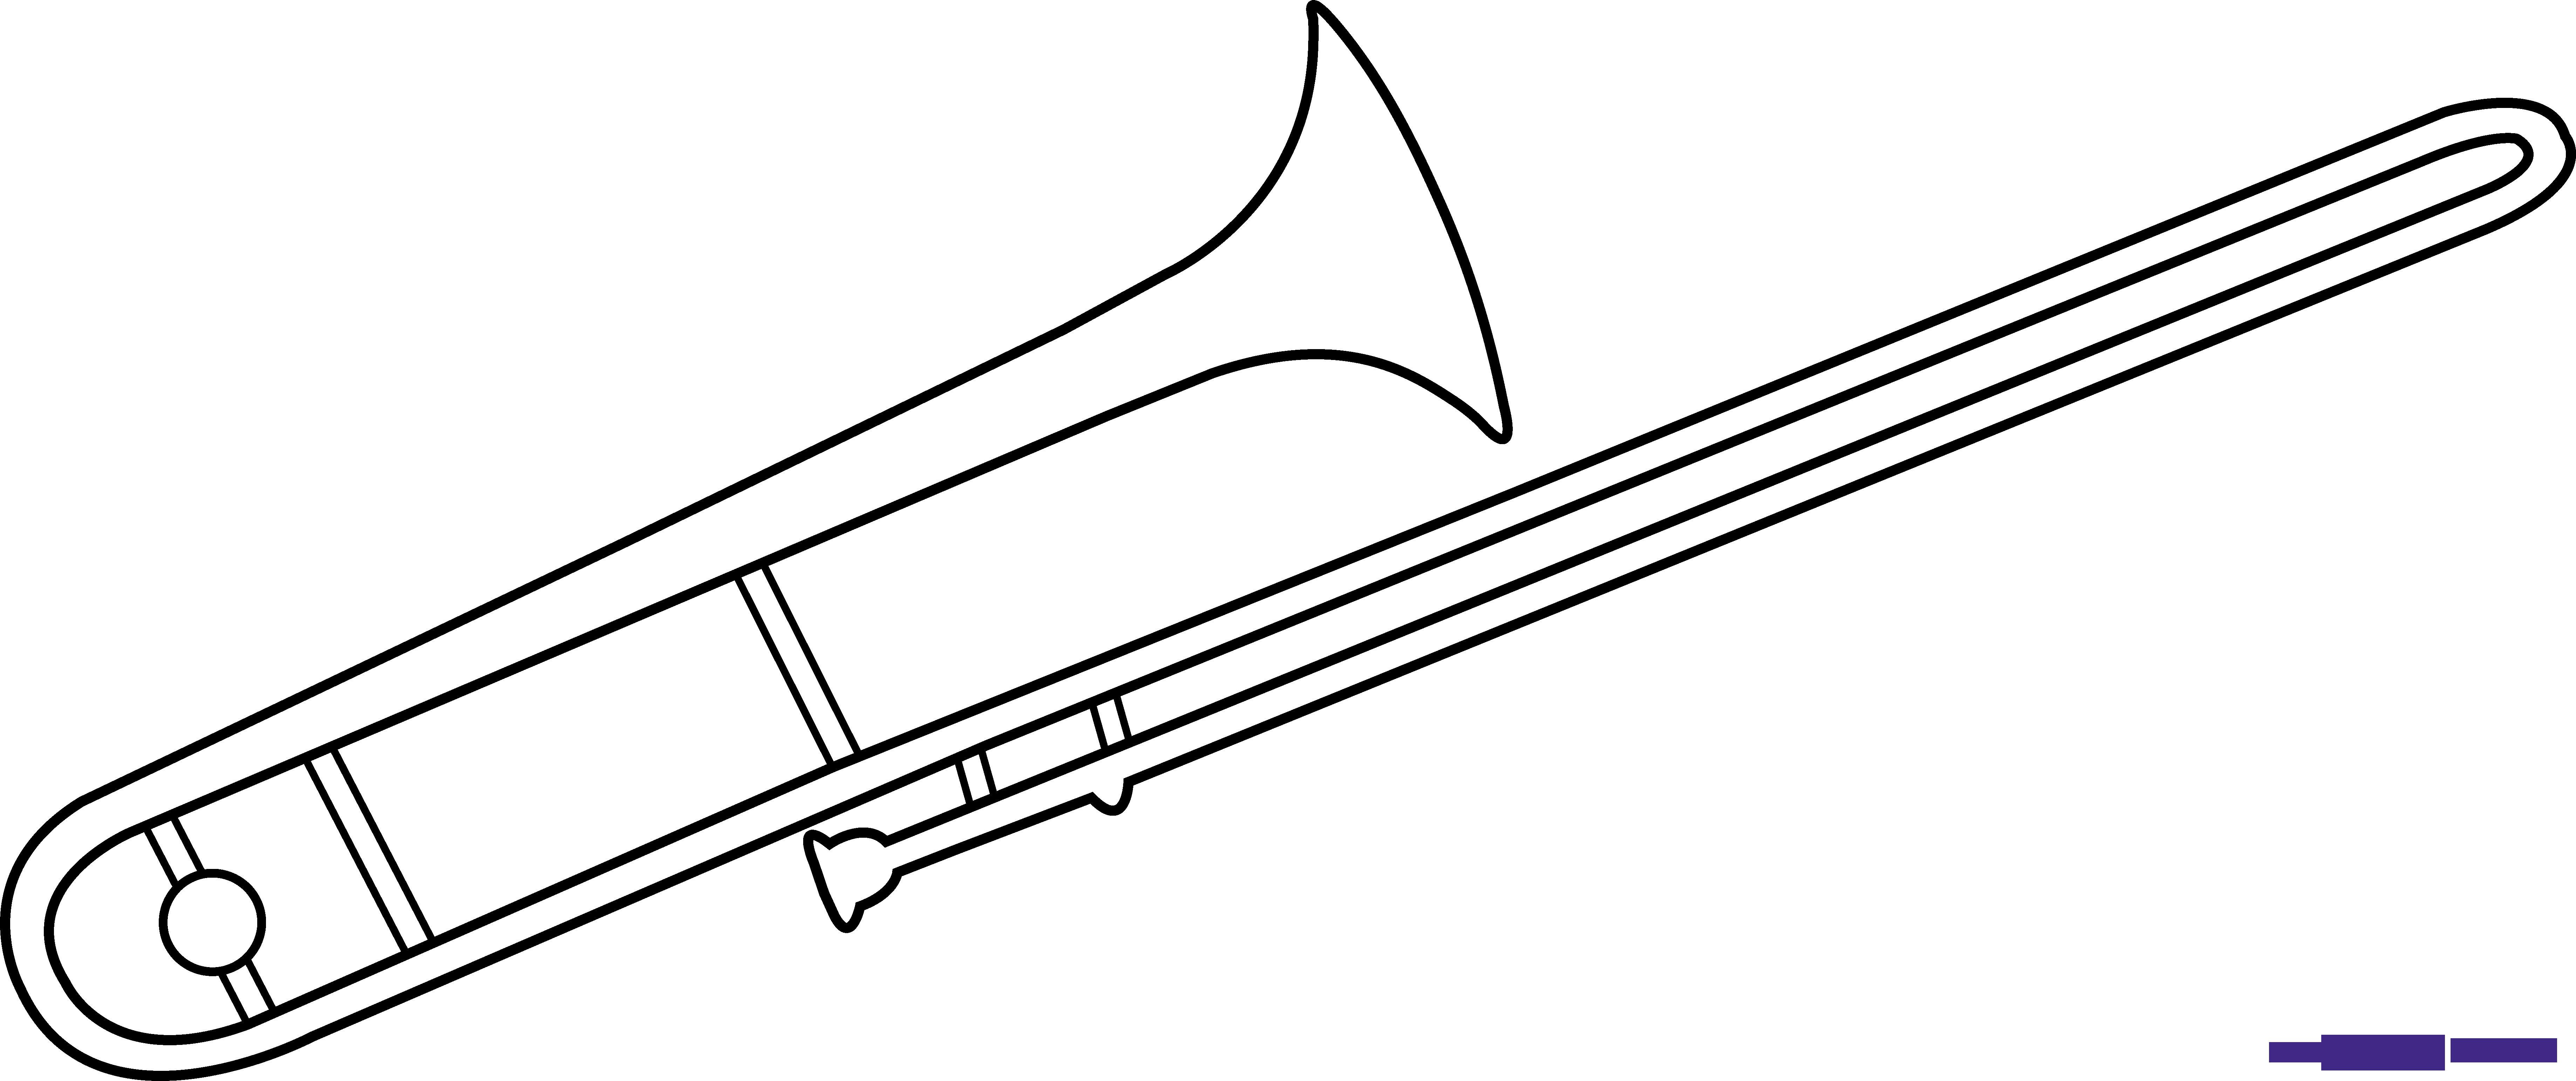 Trombone clipart black and white. Line art sweet clip